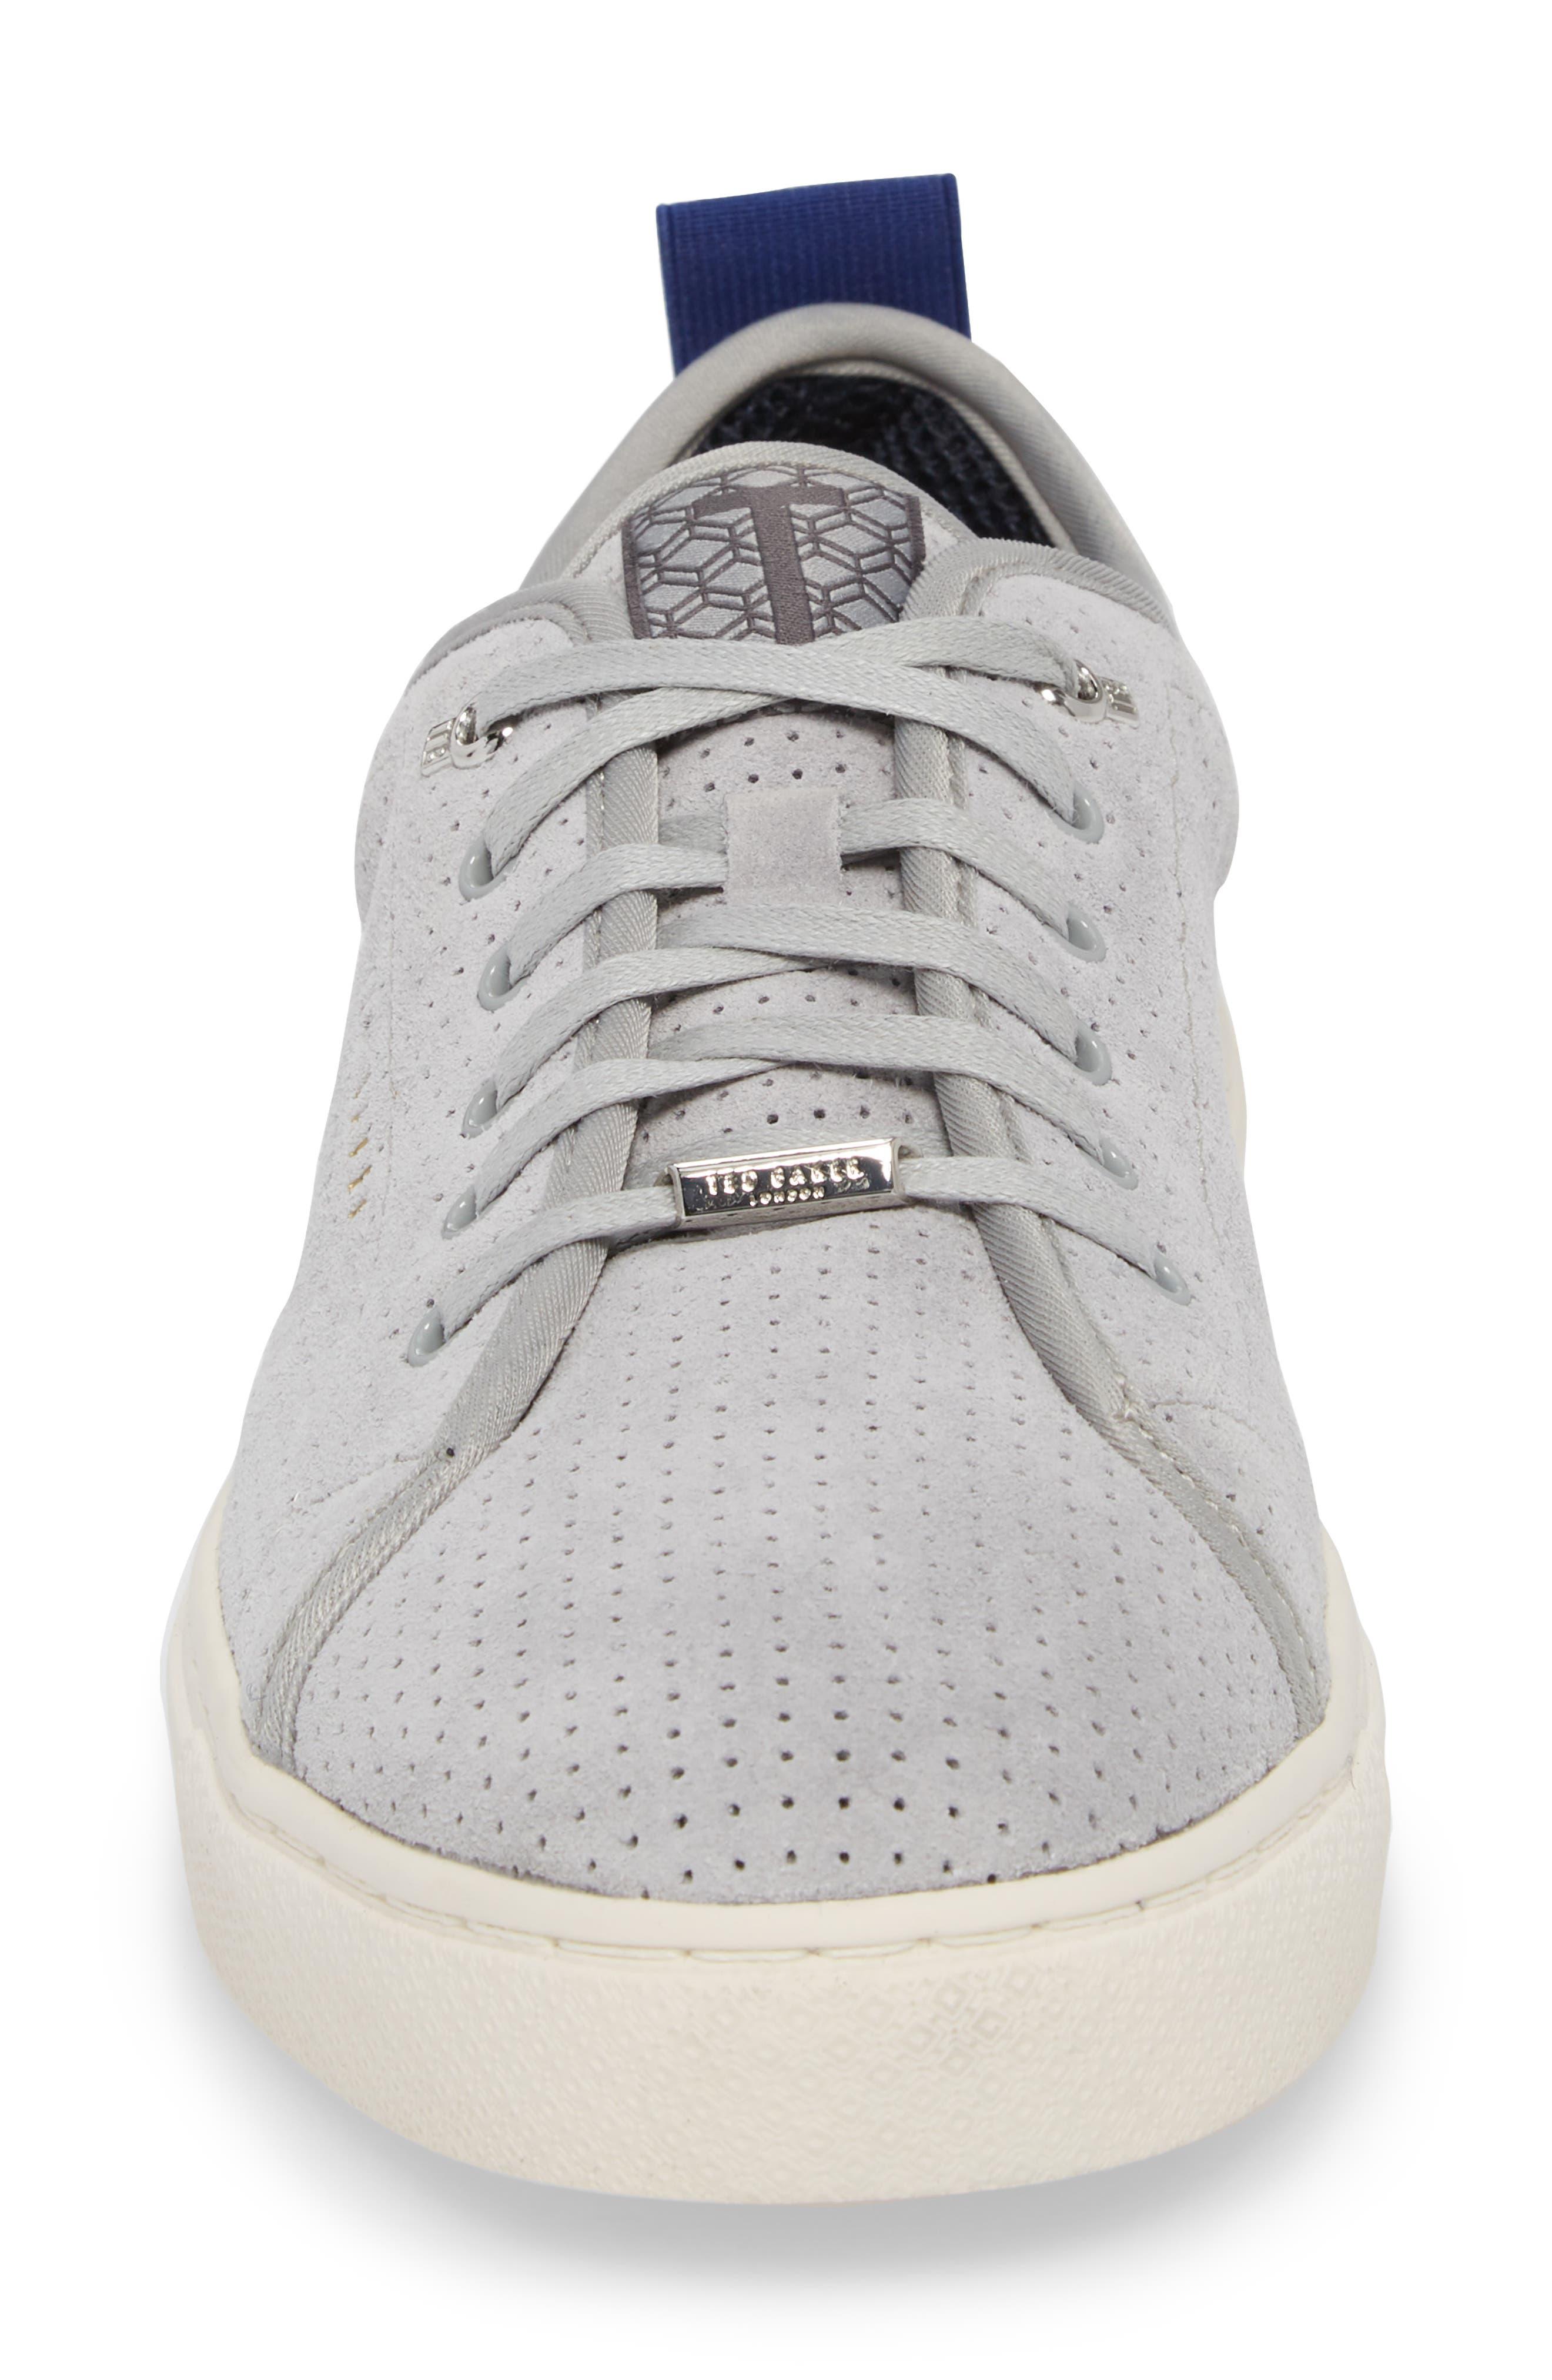 Kaliix Perforated Low Top Sneaker,                             Alternate thumbnail 4, color,                             070